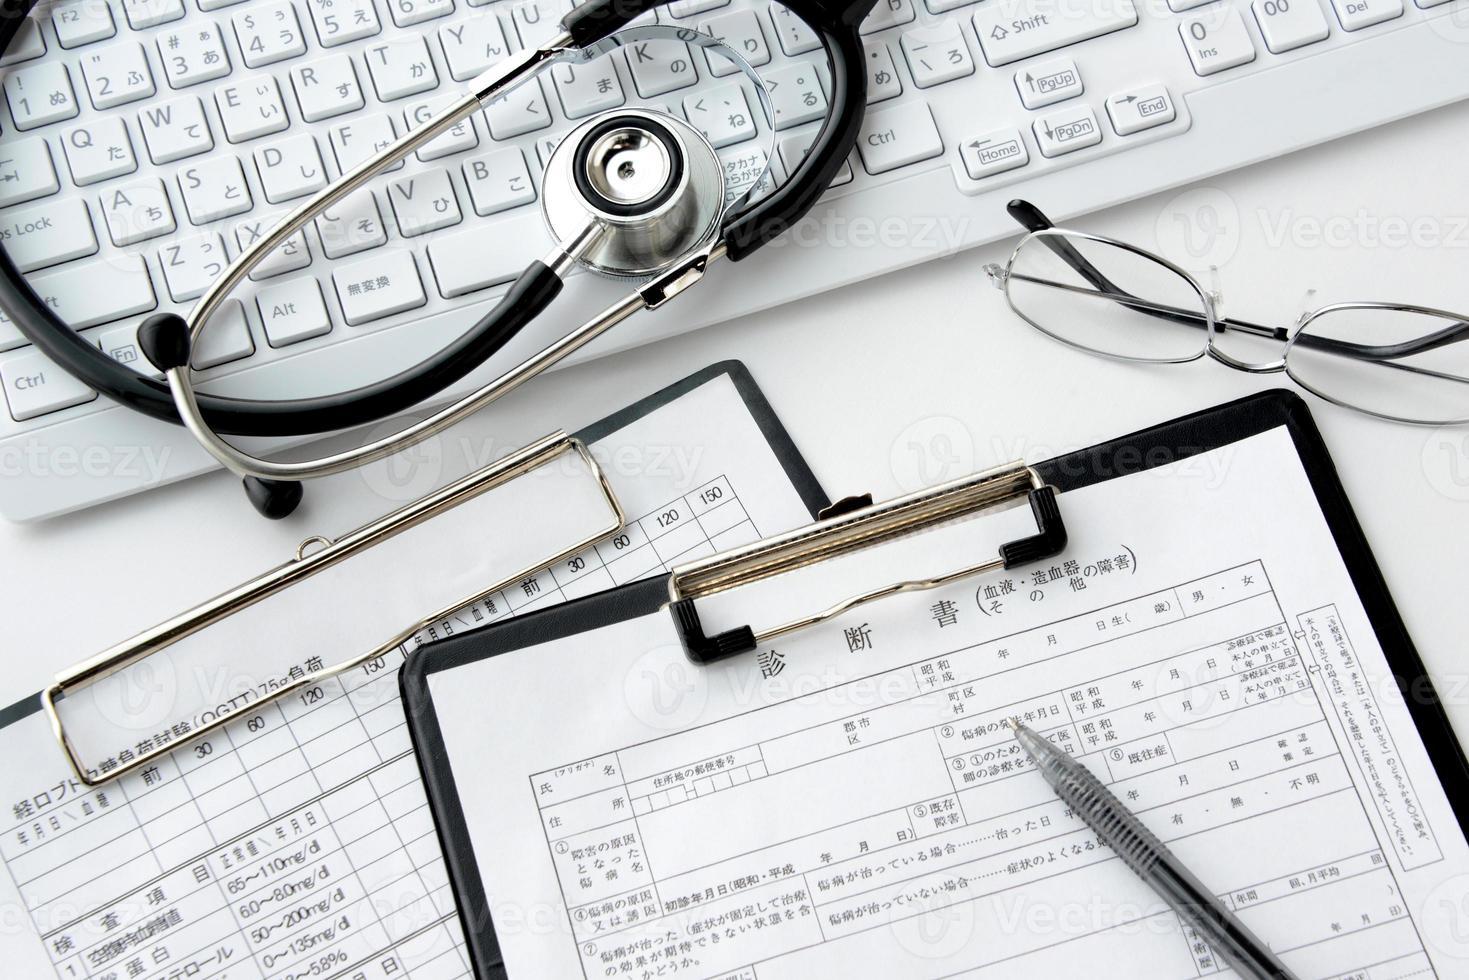 läkares skrivbord foto